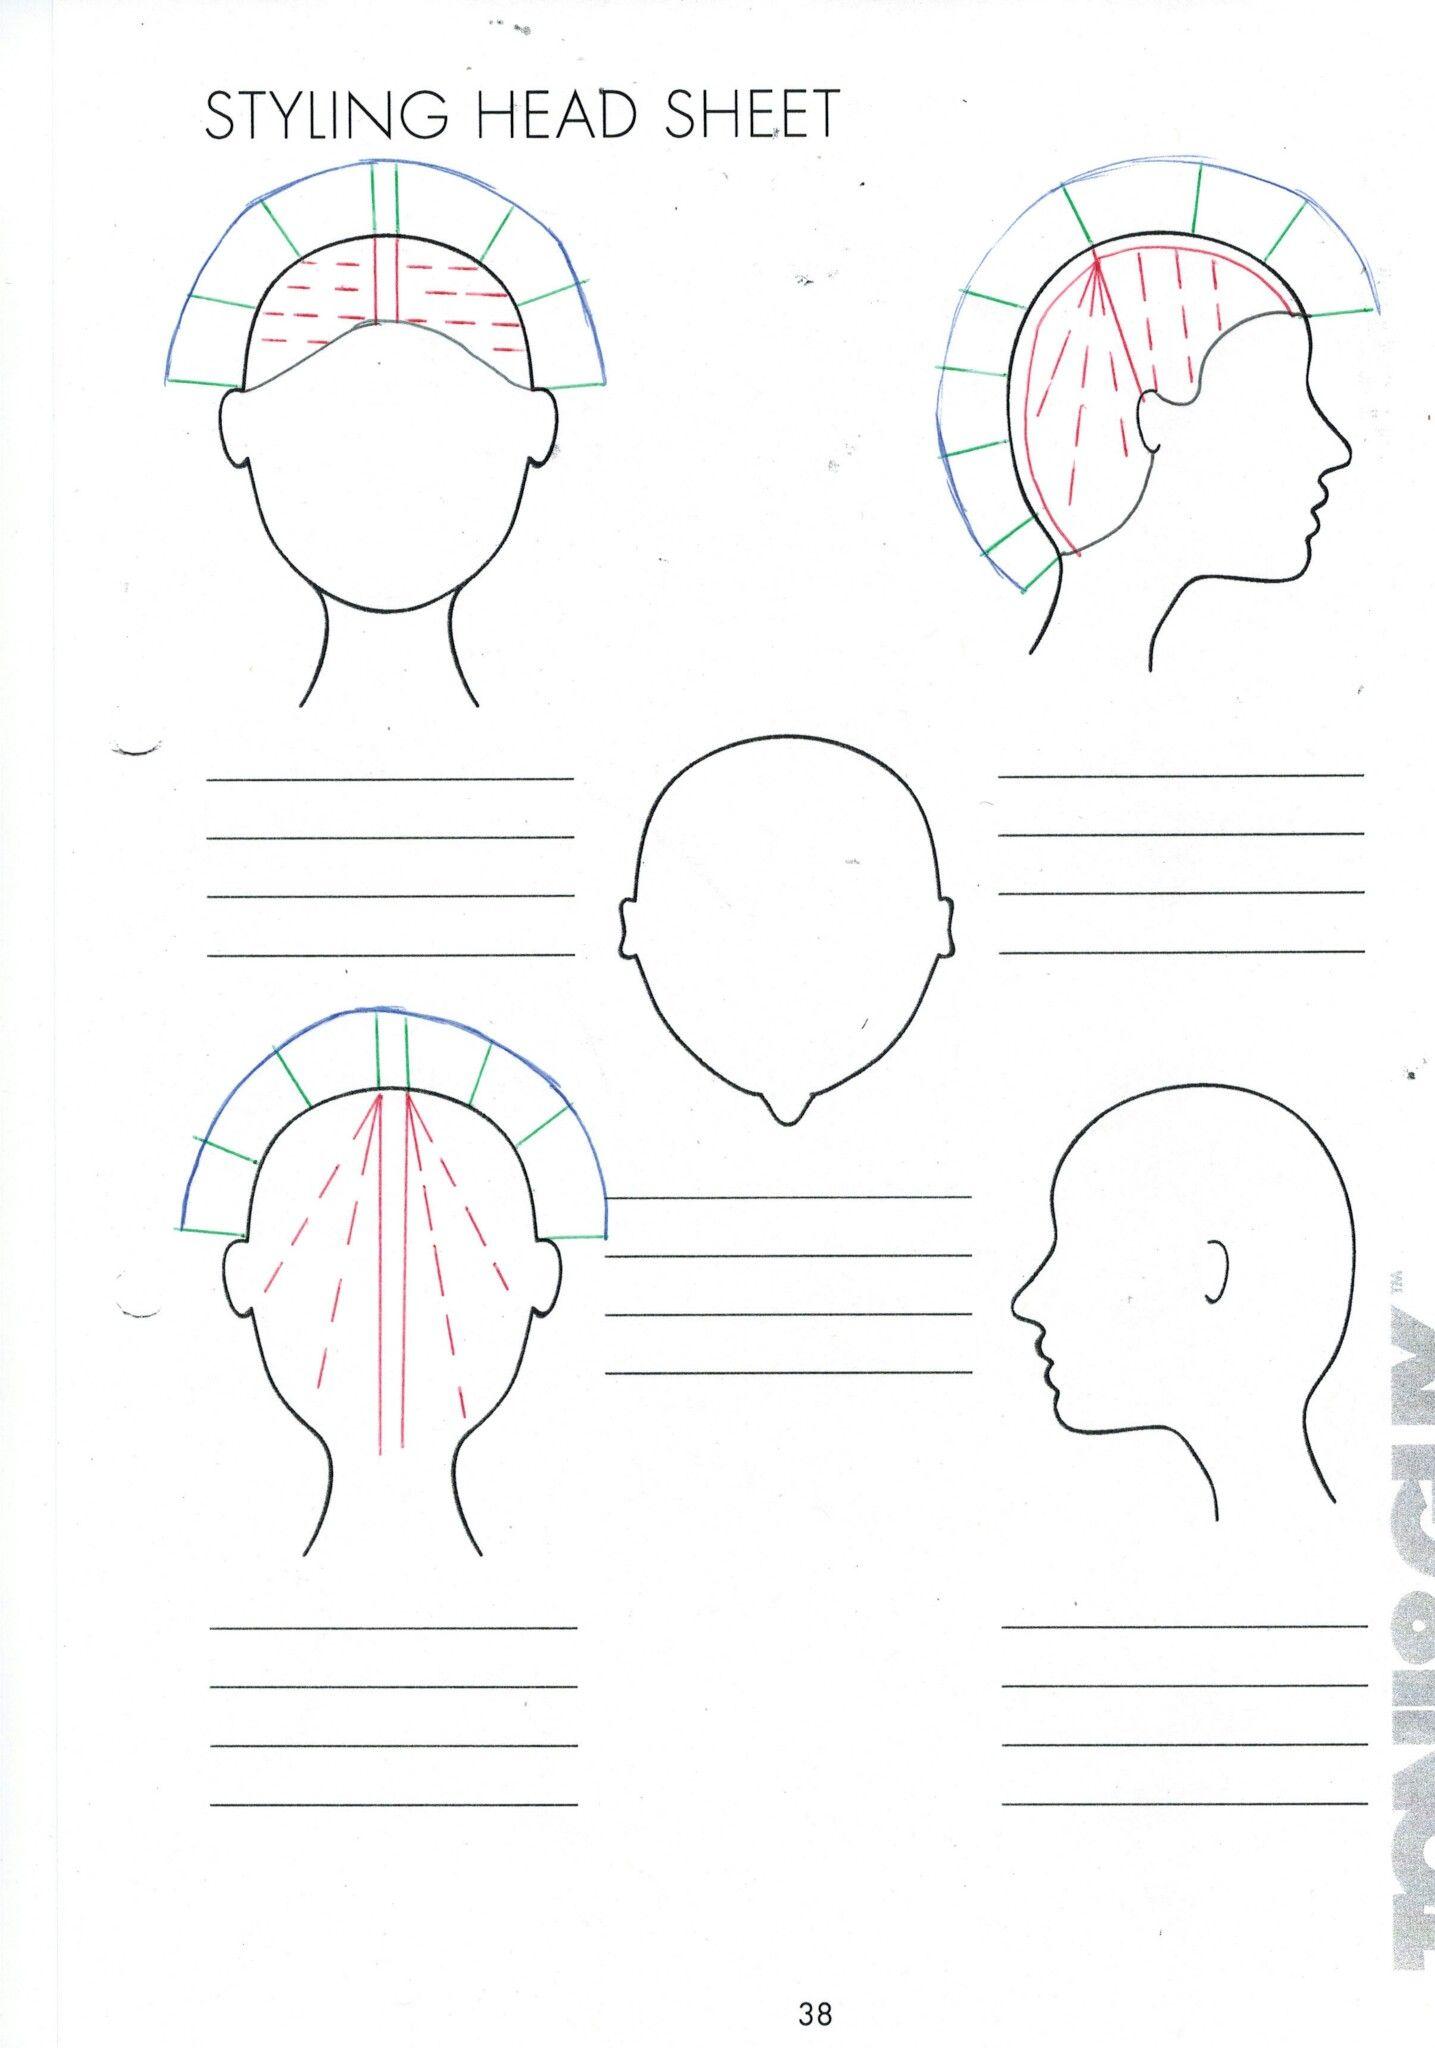 Round Layers  Hair illustration, Toni and guy, Diagonal forward